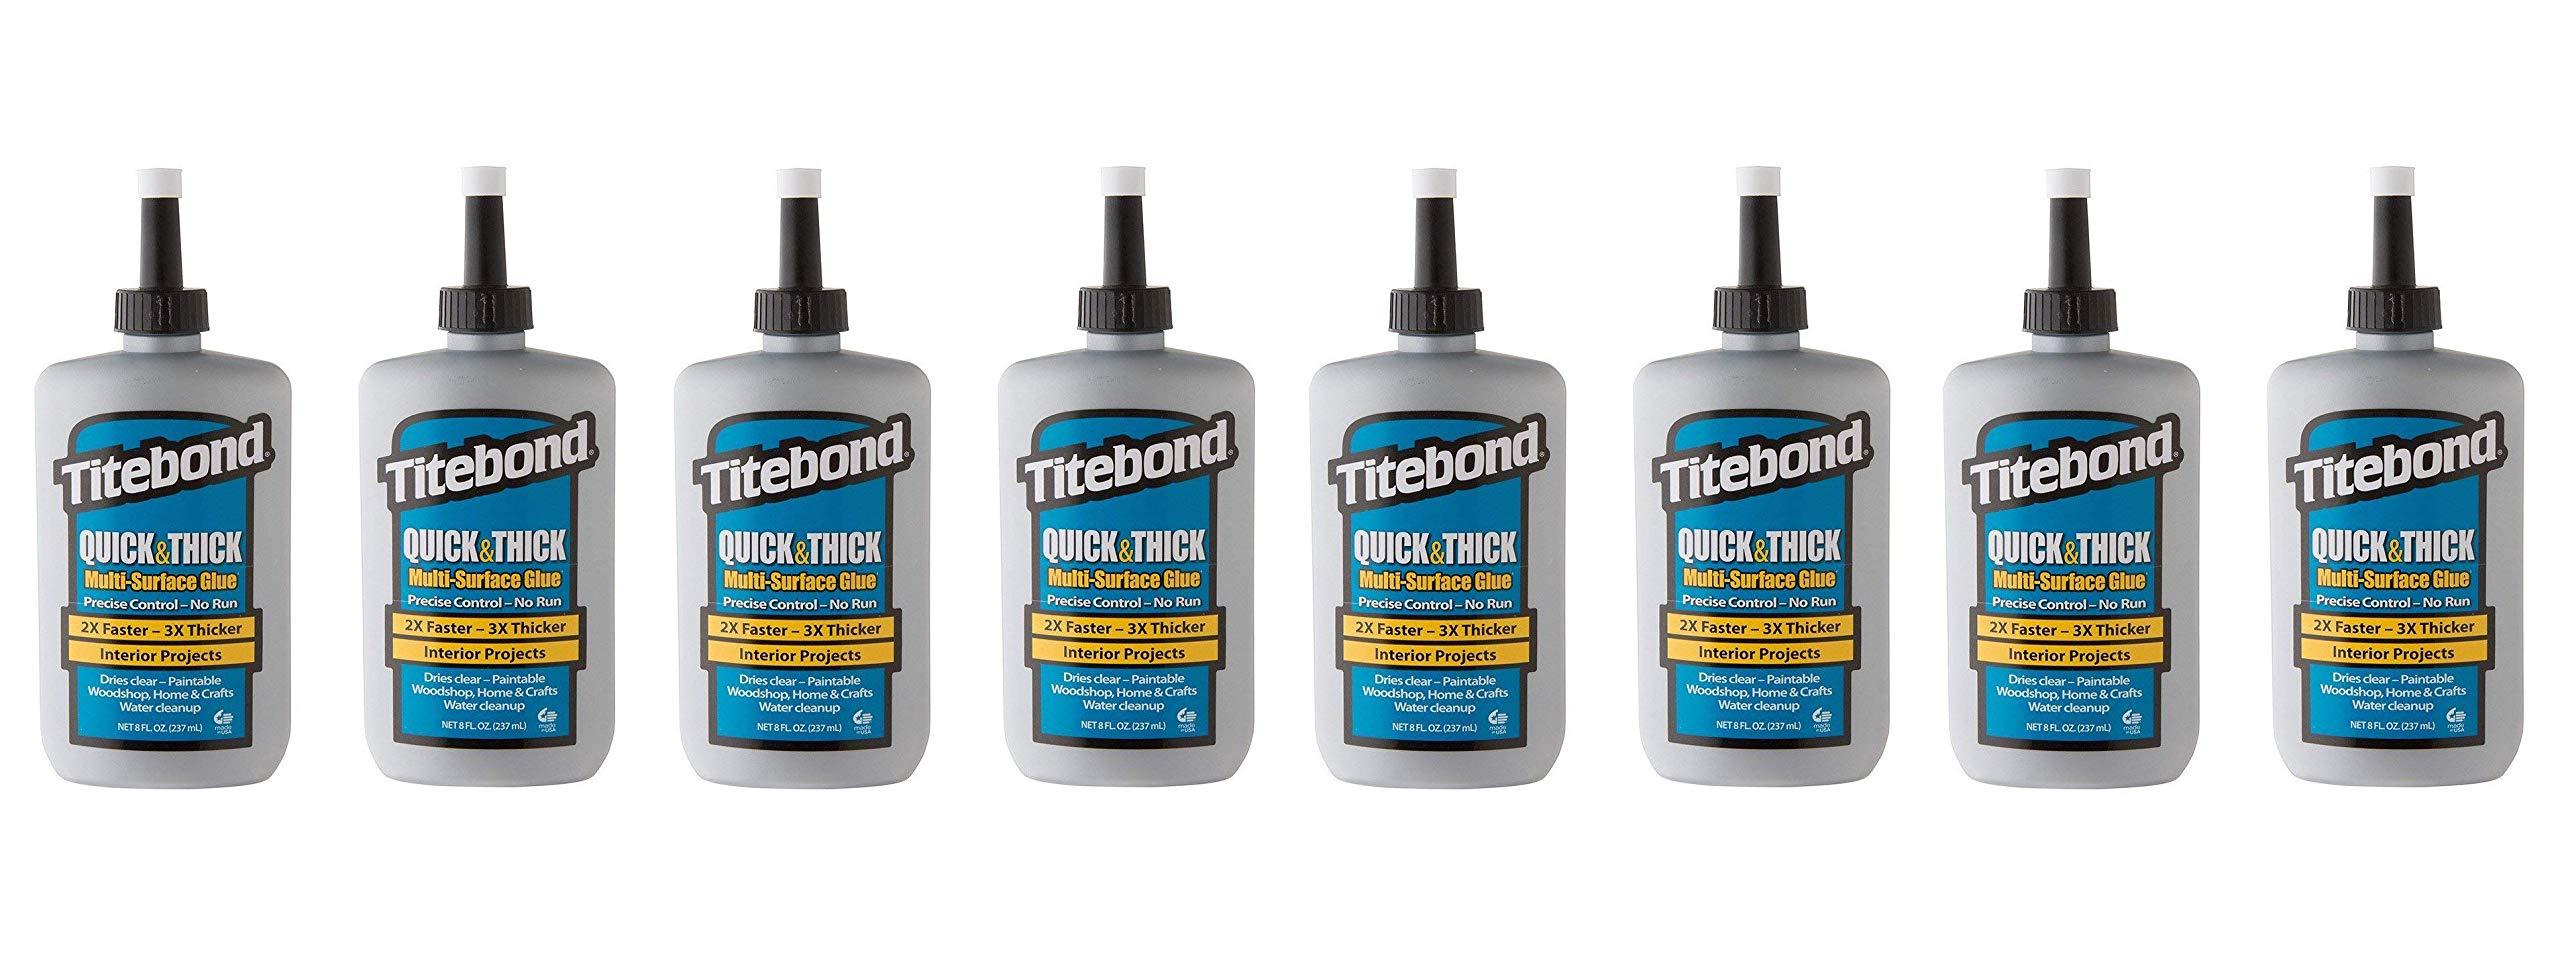 Titebond Wood Glue, Molding and Trim, 8 Oz, Beige (Fоur Paсk)